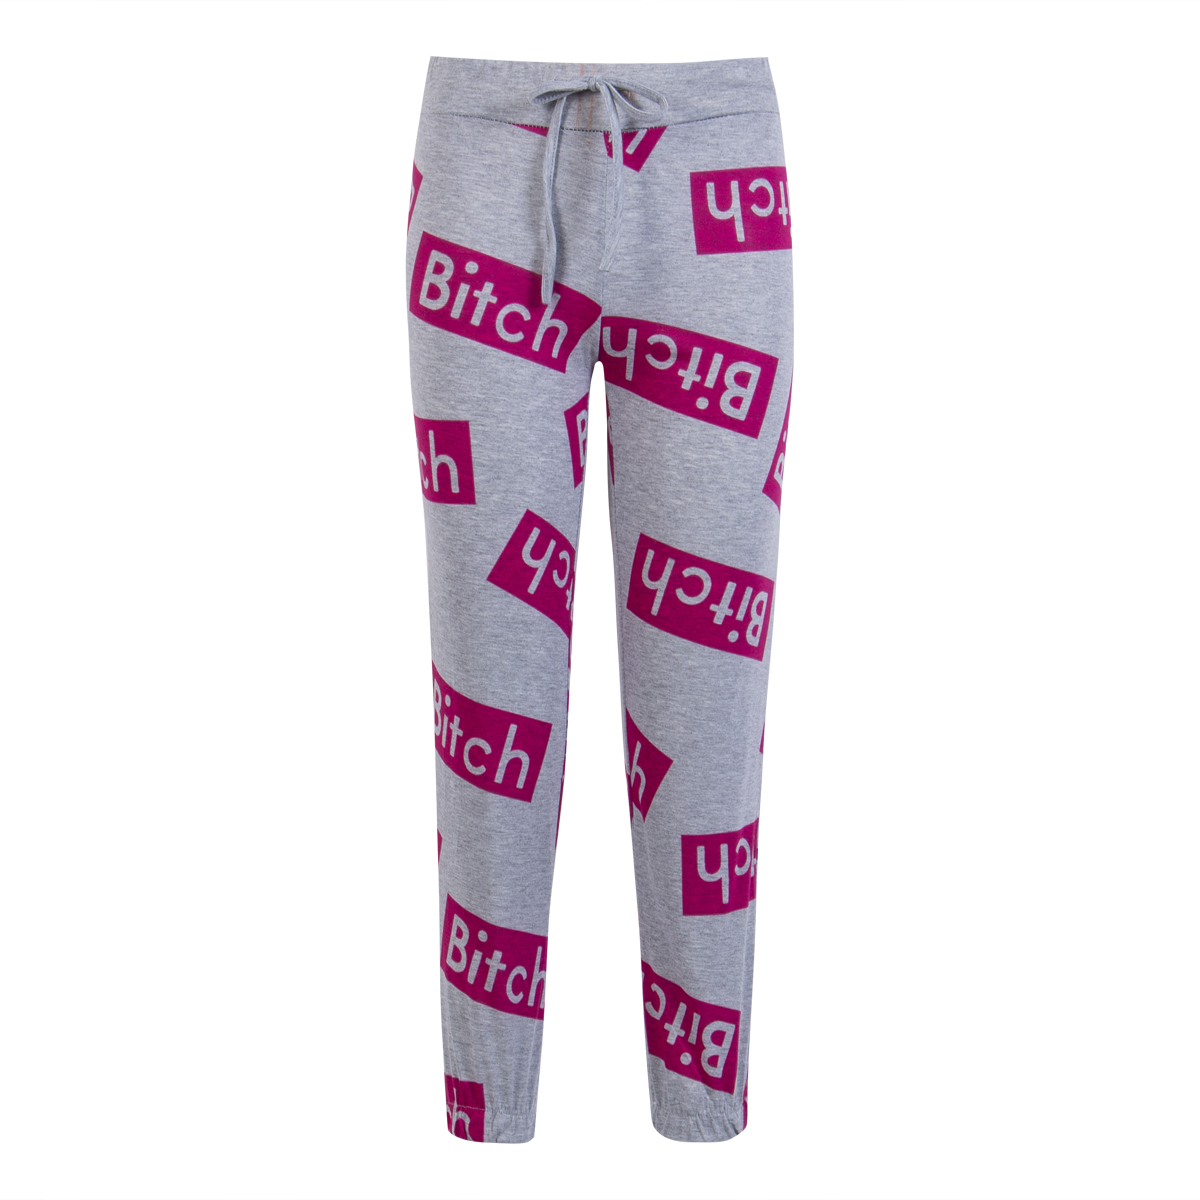 Goocheer Fashion Women Stretch Waist Jogger Workout Leggings Loose Casual Bitch Letter Print Harem Pants FitnessTrousers